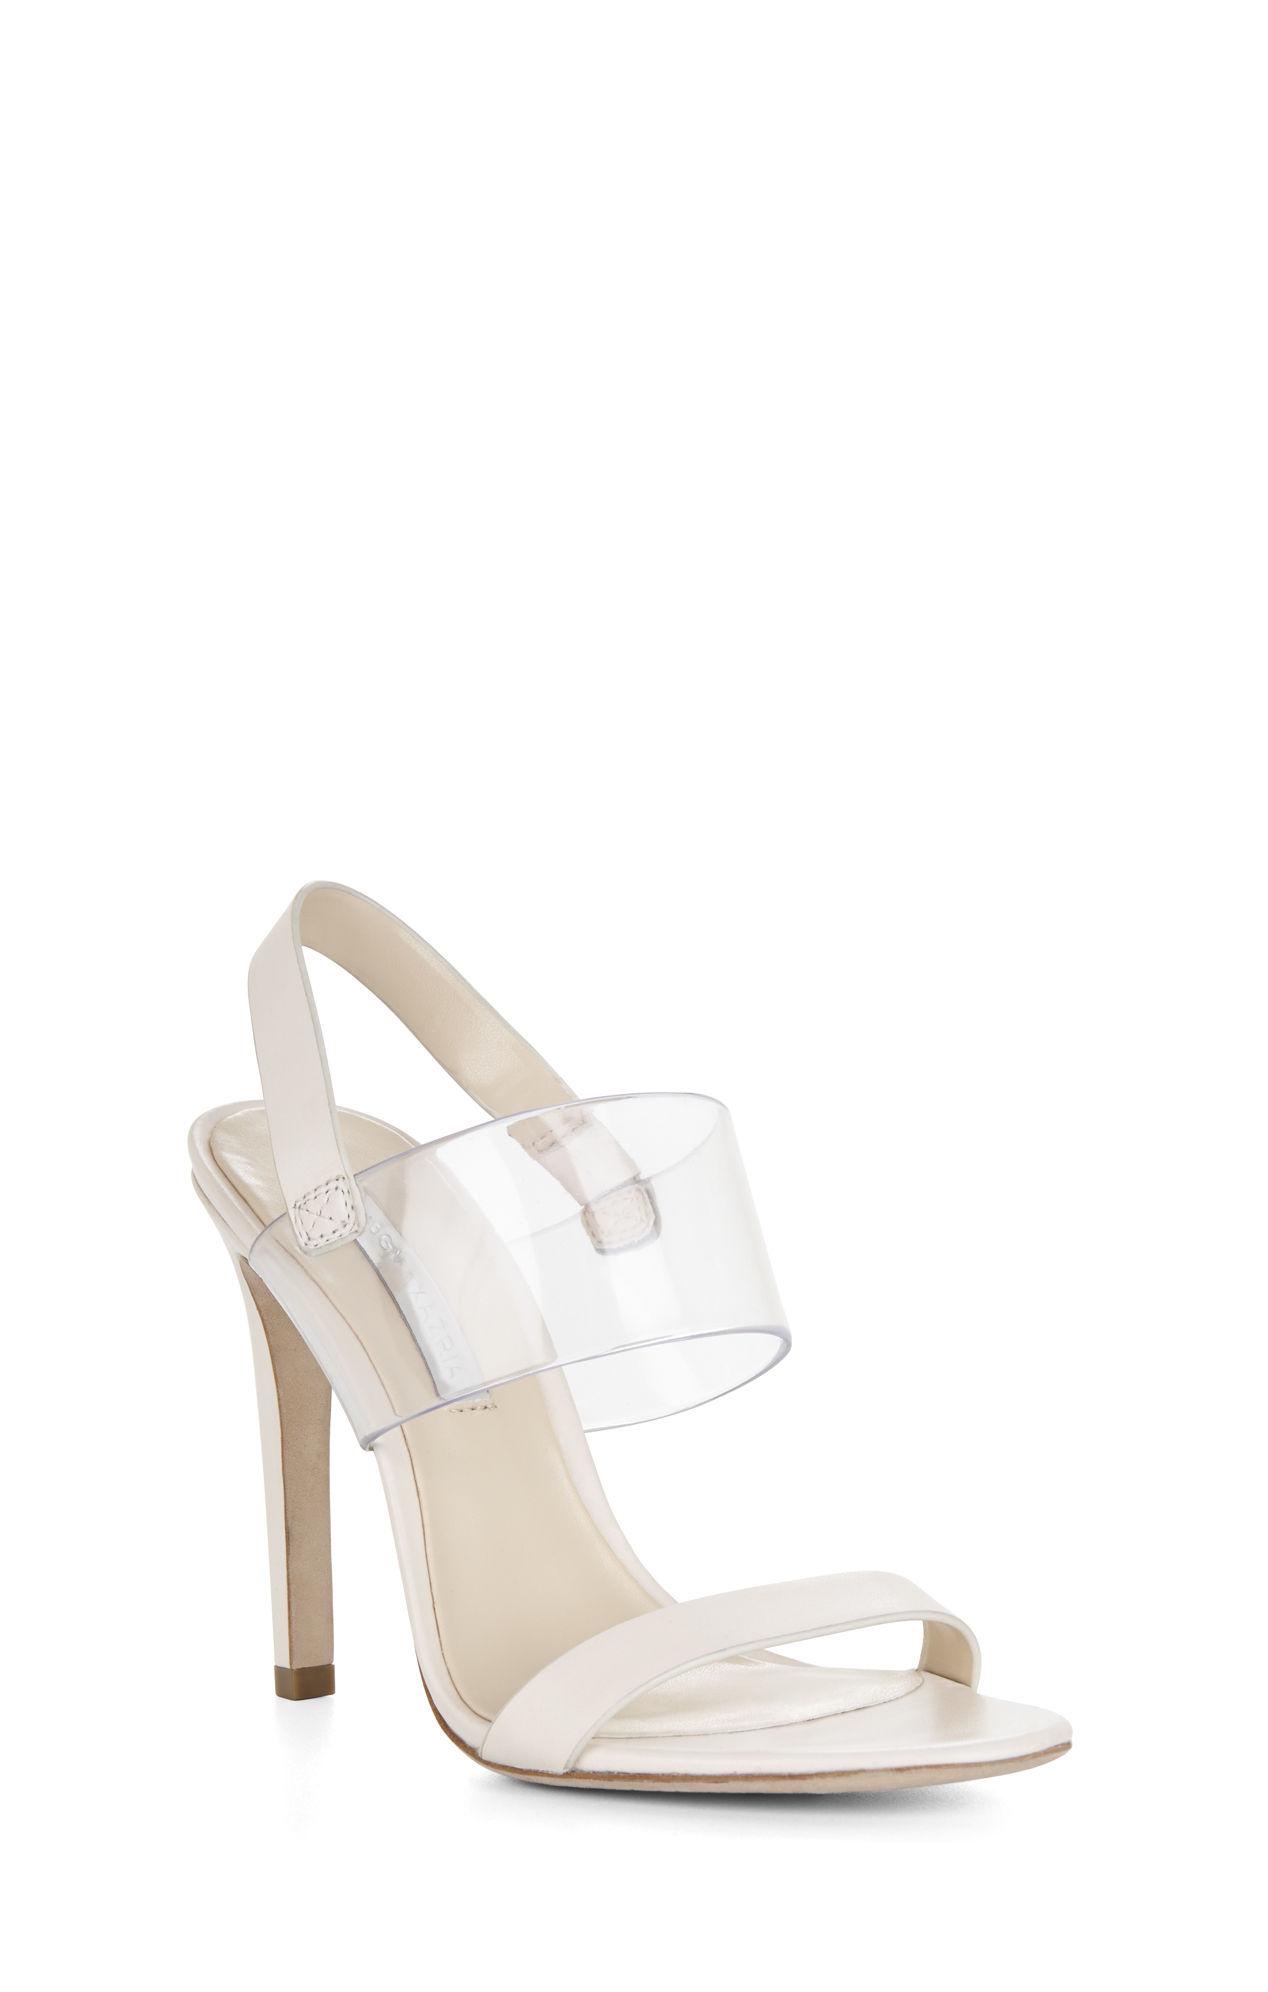 BCBG Max Azria Slingback Heels